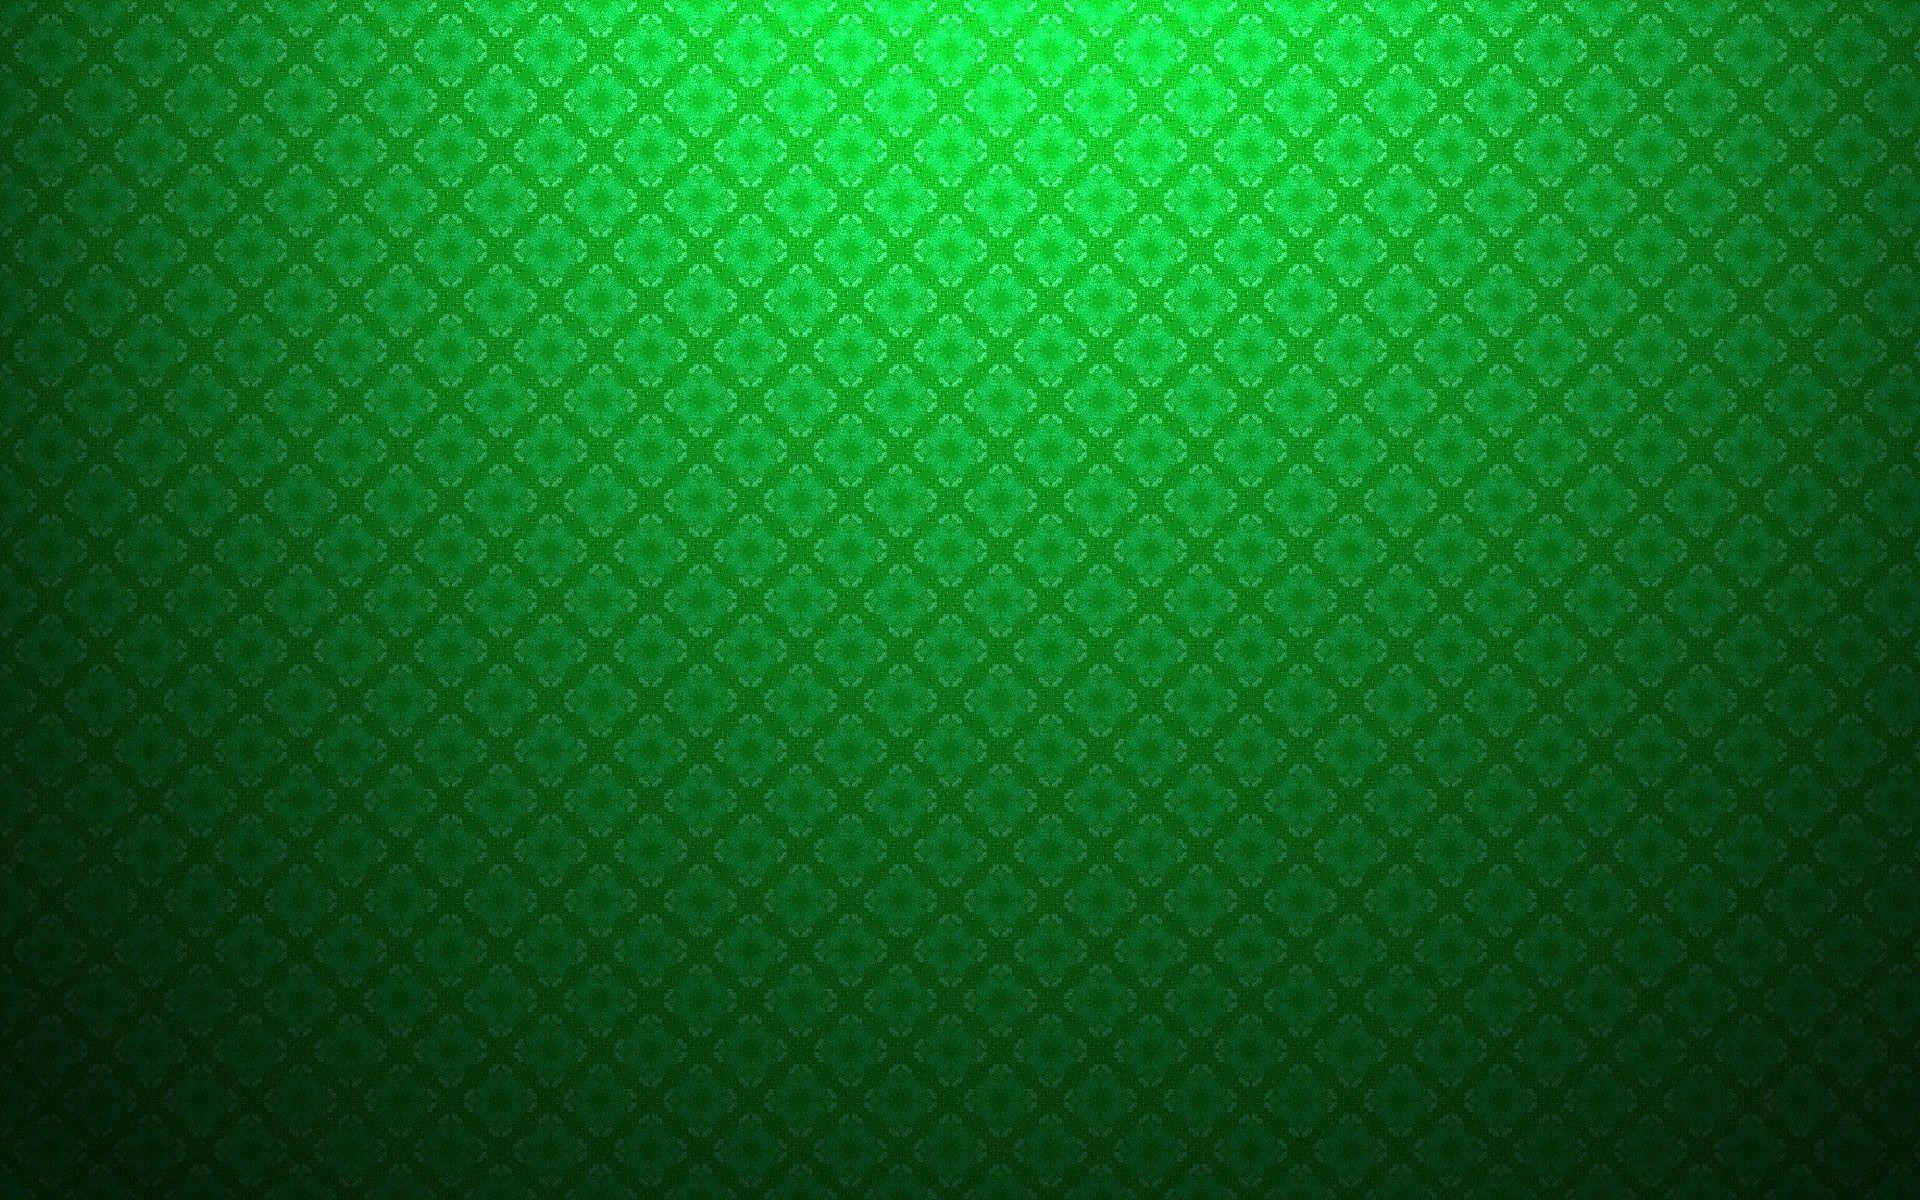 15+ Green Grunge Wallpapers